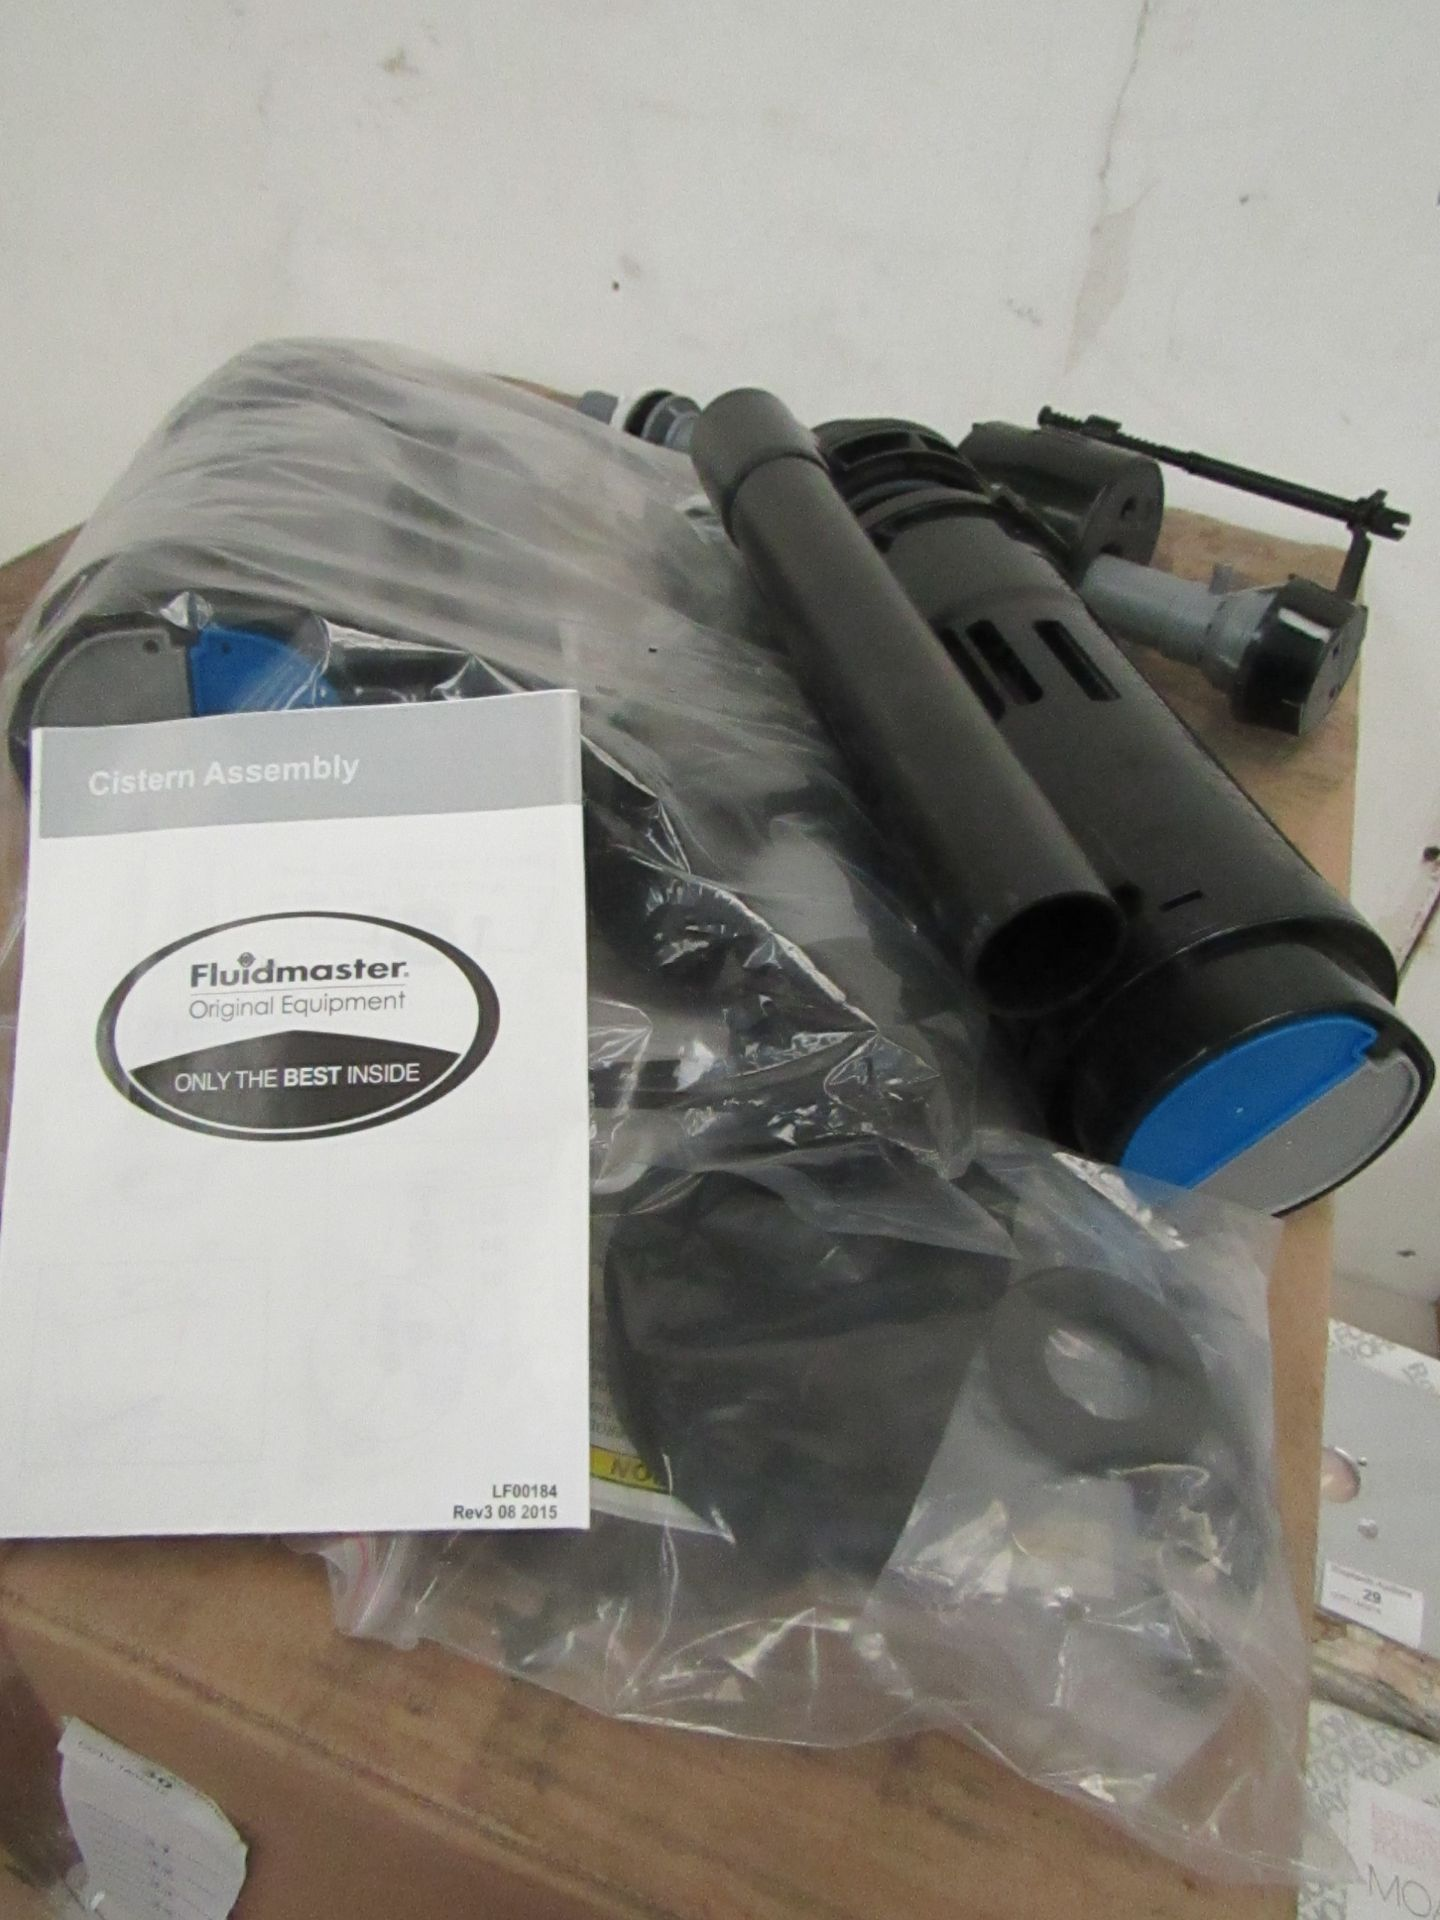 Lot 32 - Fluid master 400 Cistern flush system, new in packaging